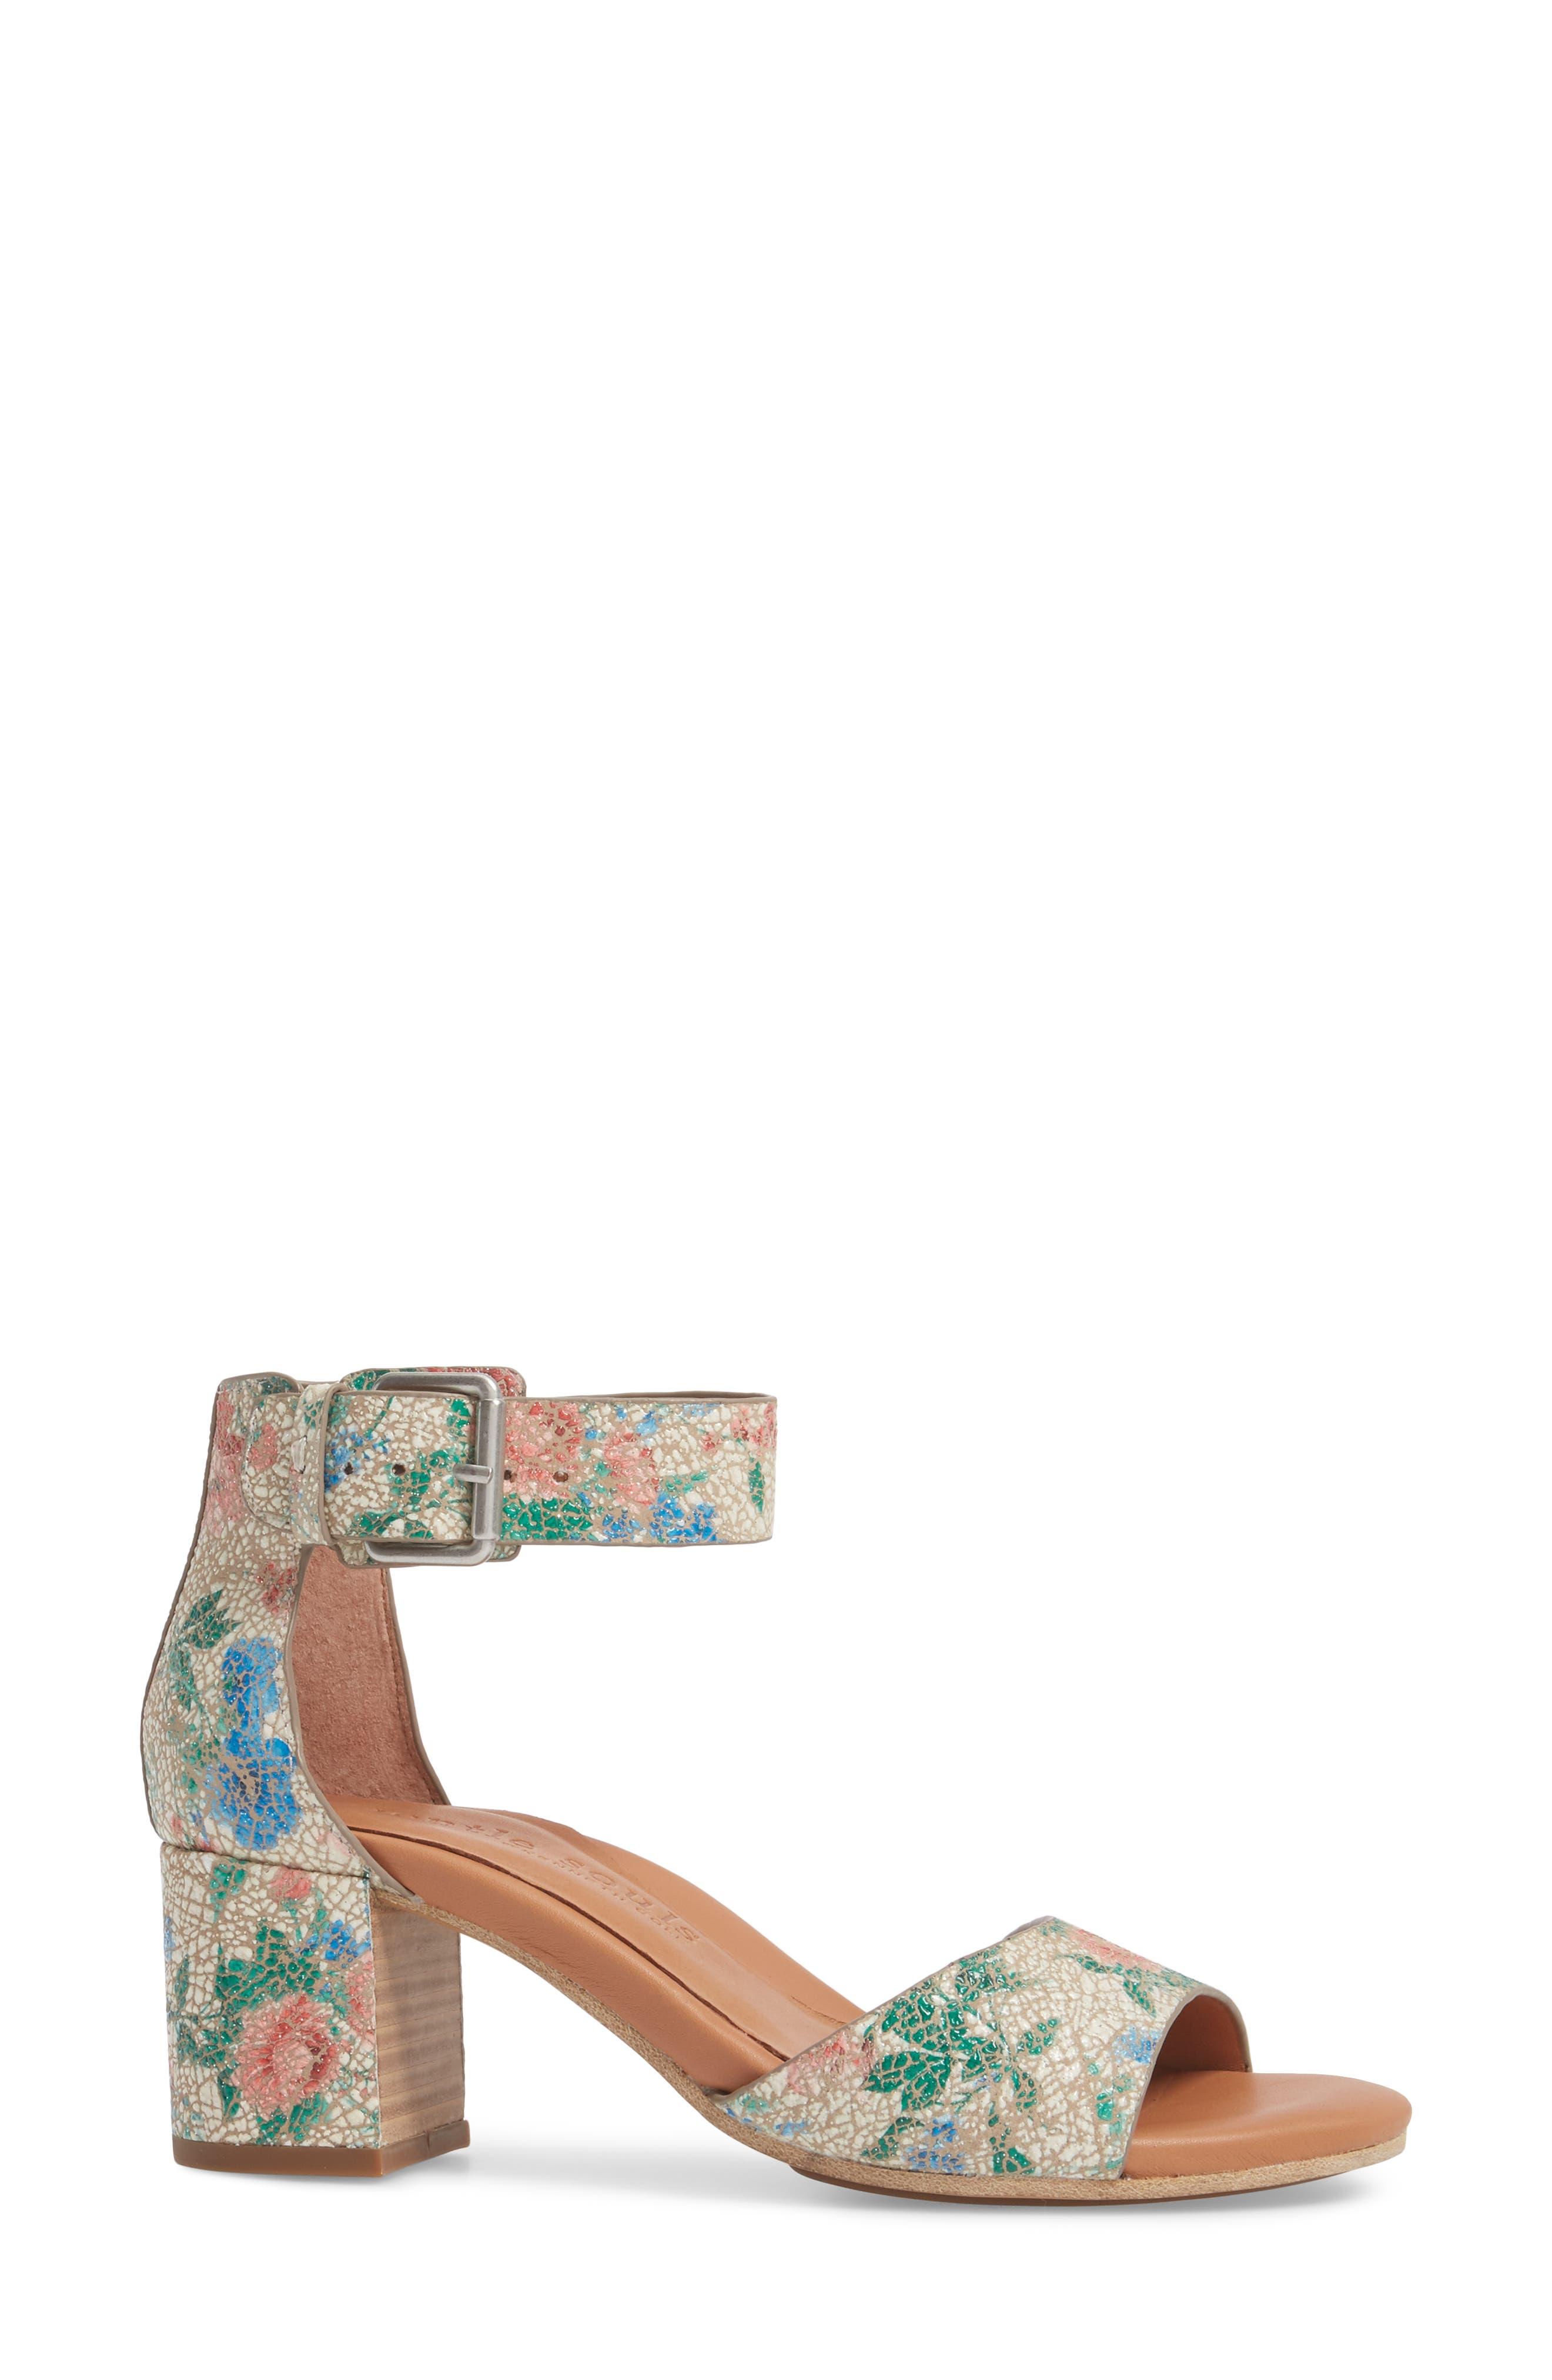 Alternate Image 3  - Gentle Souls Christa Block Heel Sandal (Women)